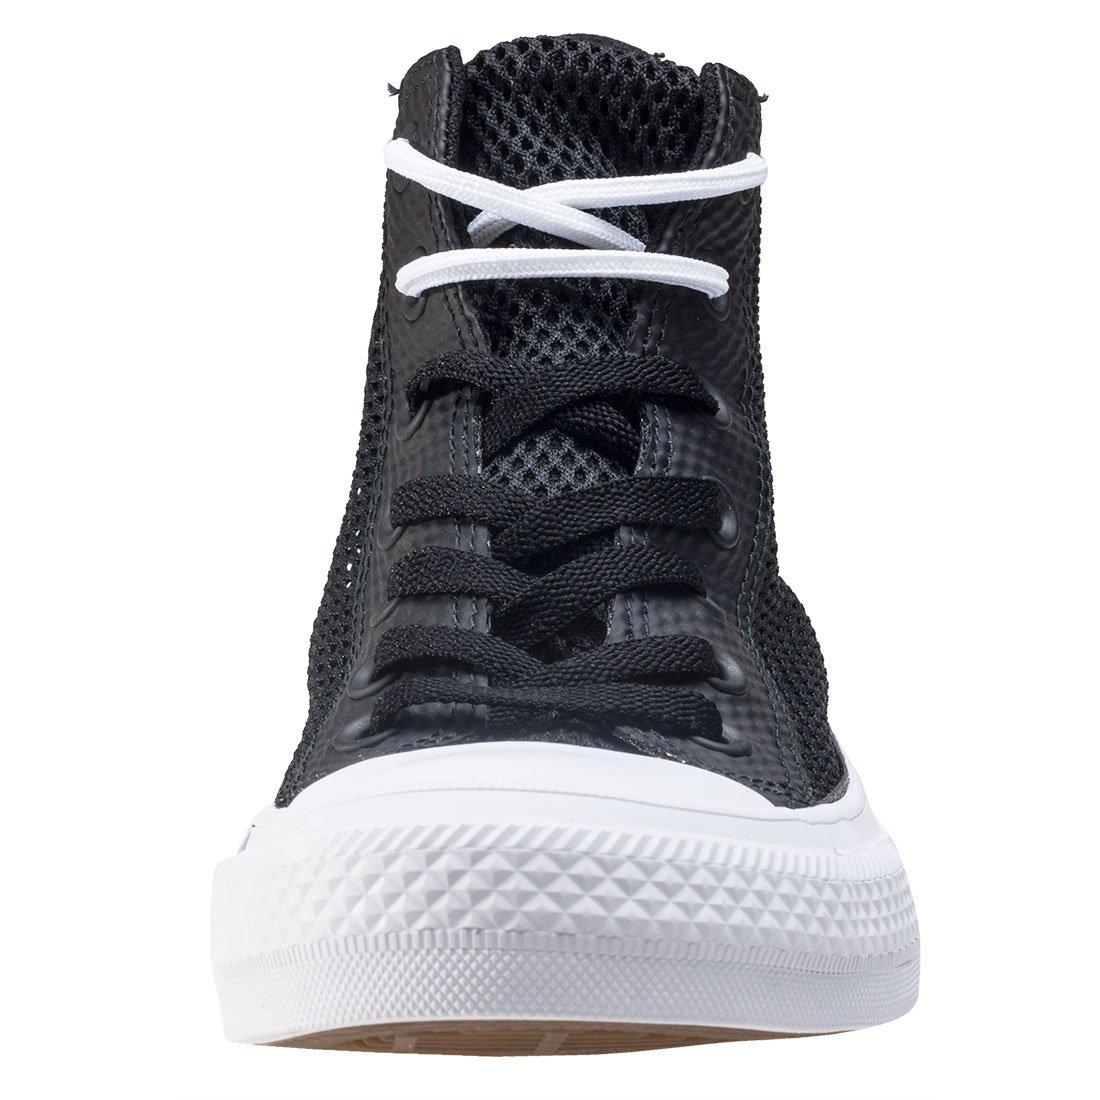 d9f7106b4a53 Converse Men s Chuck Taylor All Star Ii High Hi-Top Trainers  Amazon.co.uk   Shoes   Bags